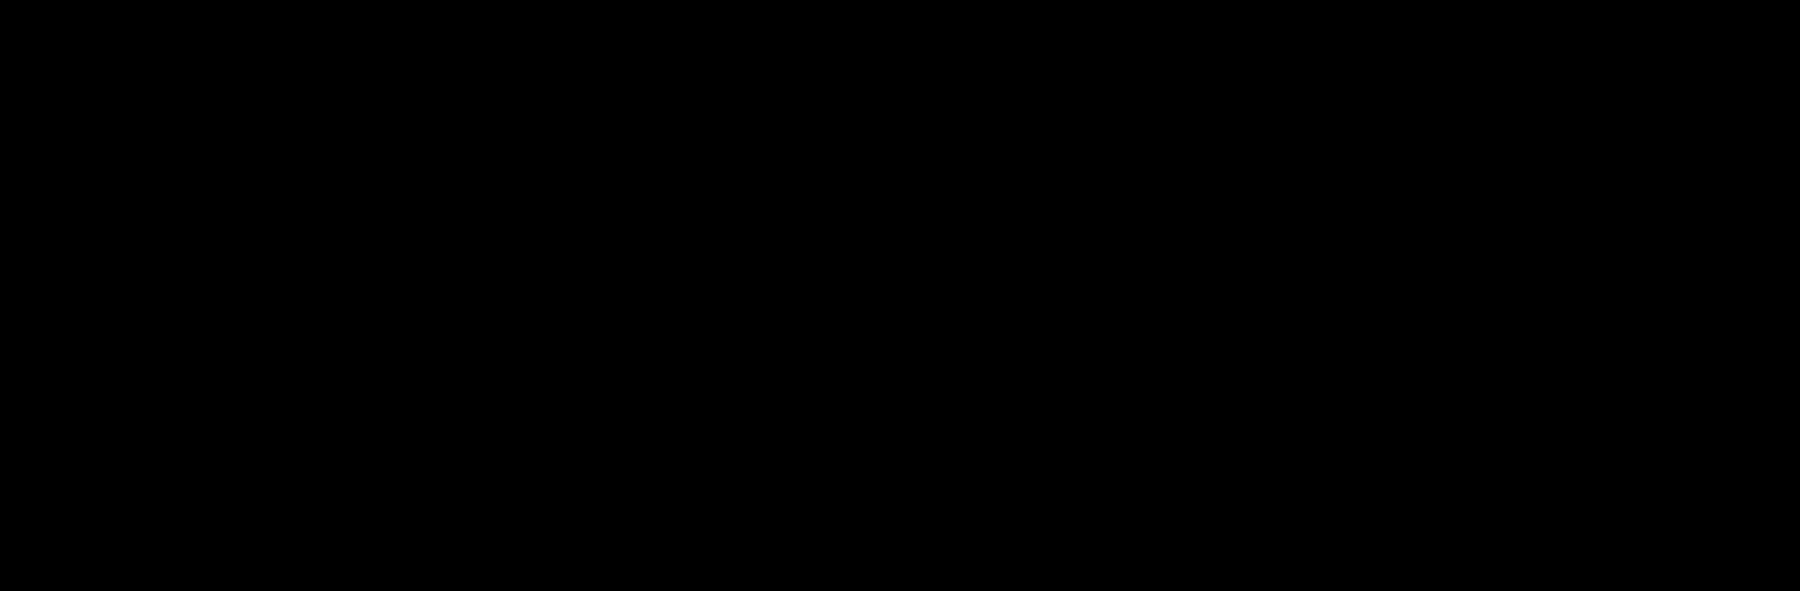 Decorative clipart squiggly line. Divider cliparts zone black